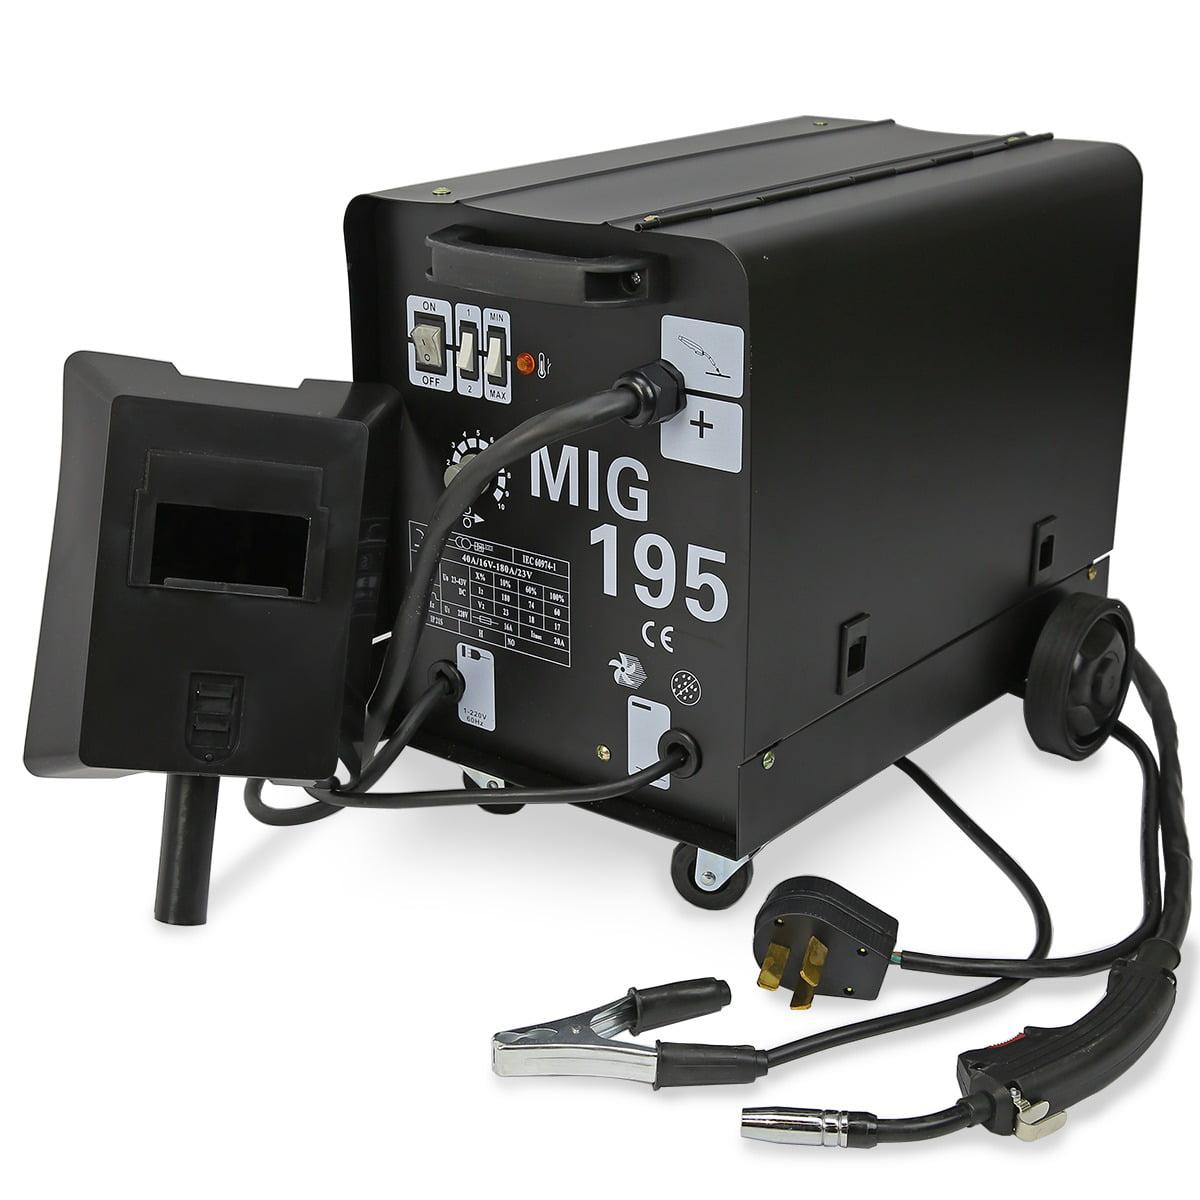 230V 195AMP DUAL MIG195 Flux Core Auto Wire Welding Welder